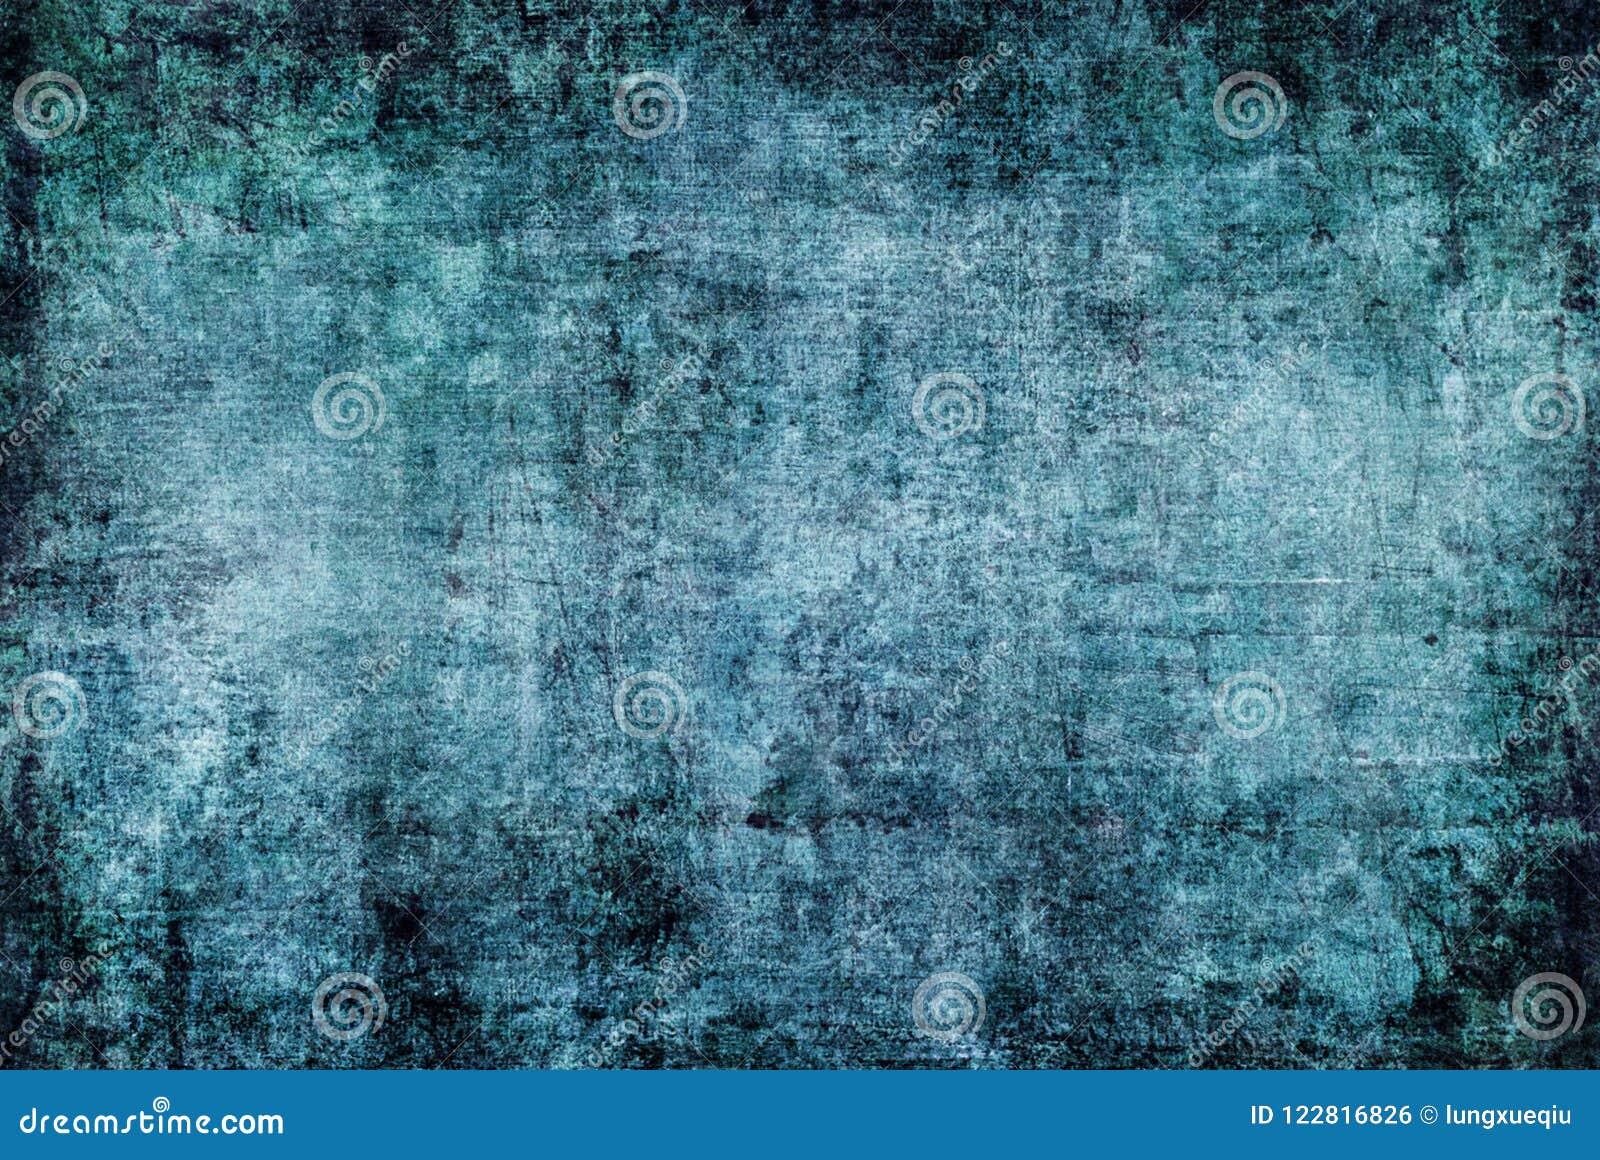 Vert bleu de peinture abstraite foncée Rusty Distorted Decay Old Texture grunge pour Autumn Background Wallpaper